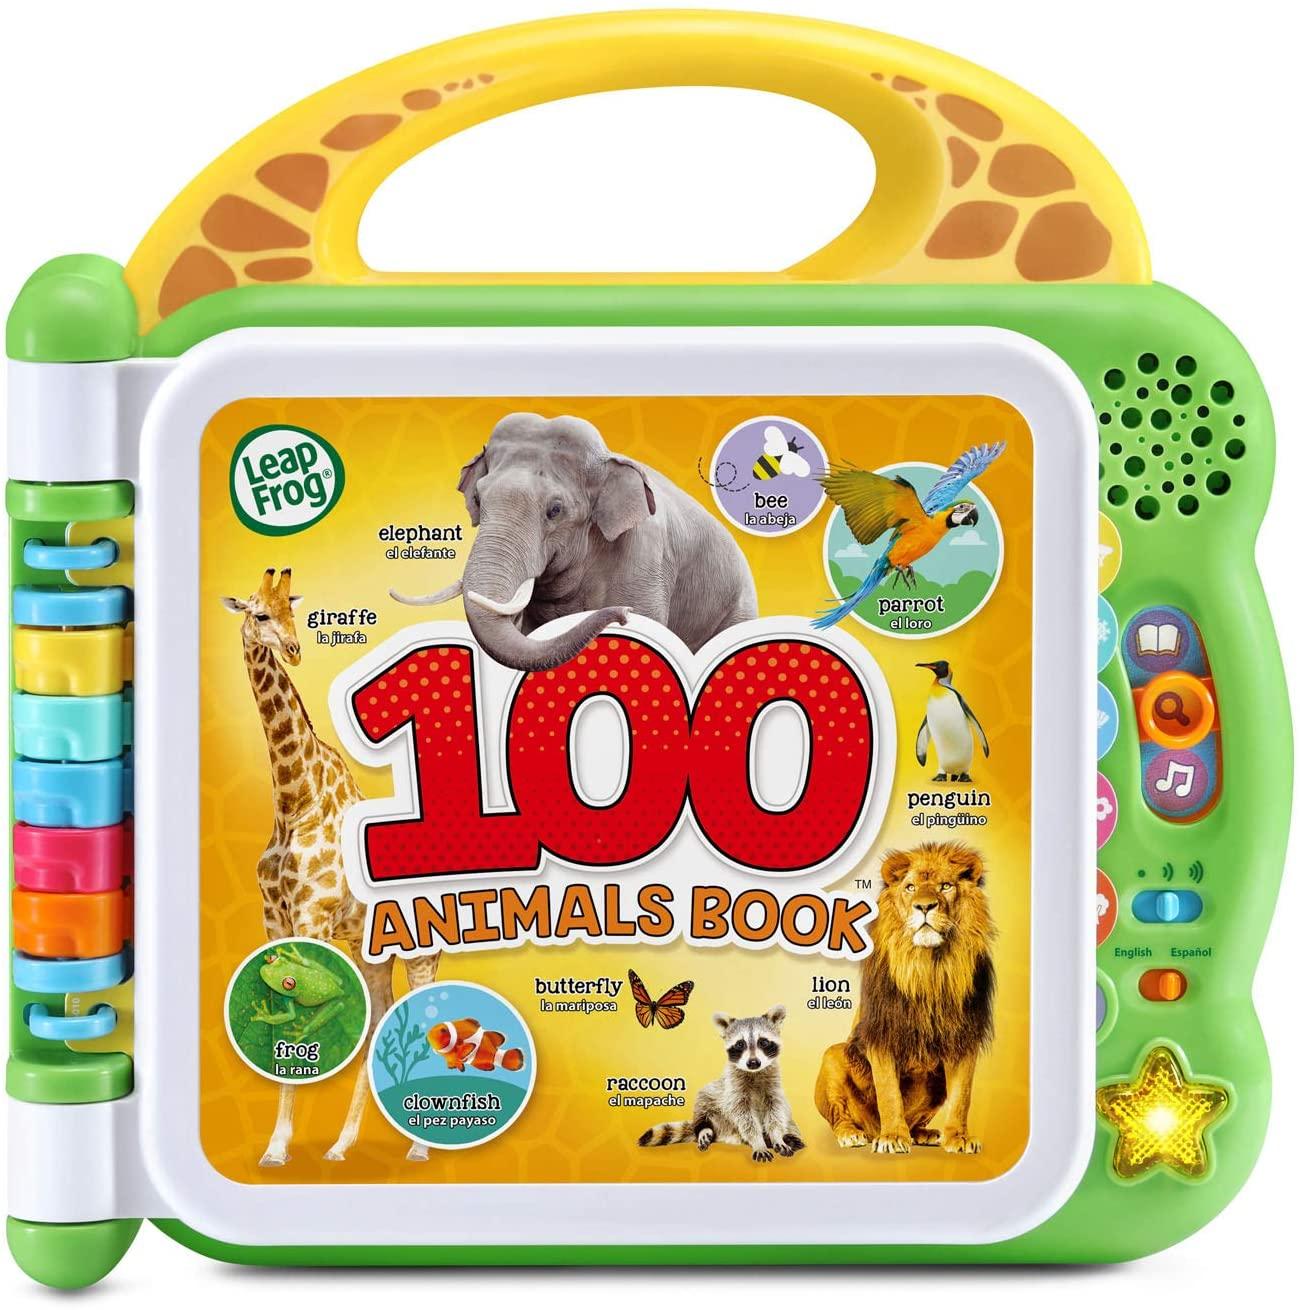 Leapfrog-100-Animals-Book